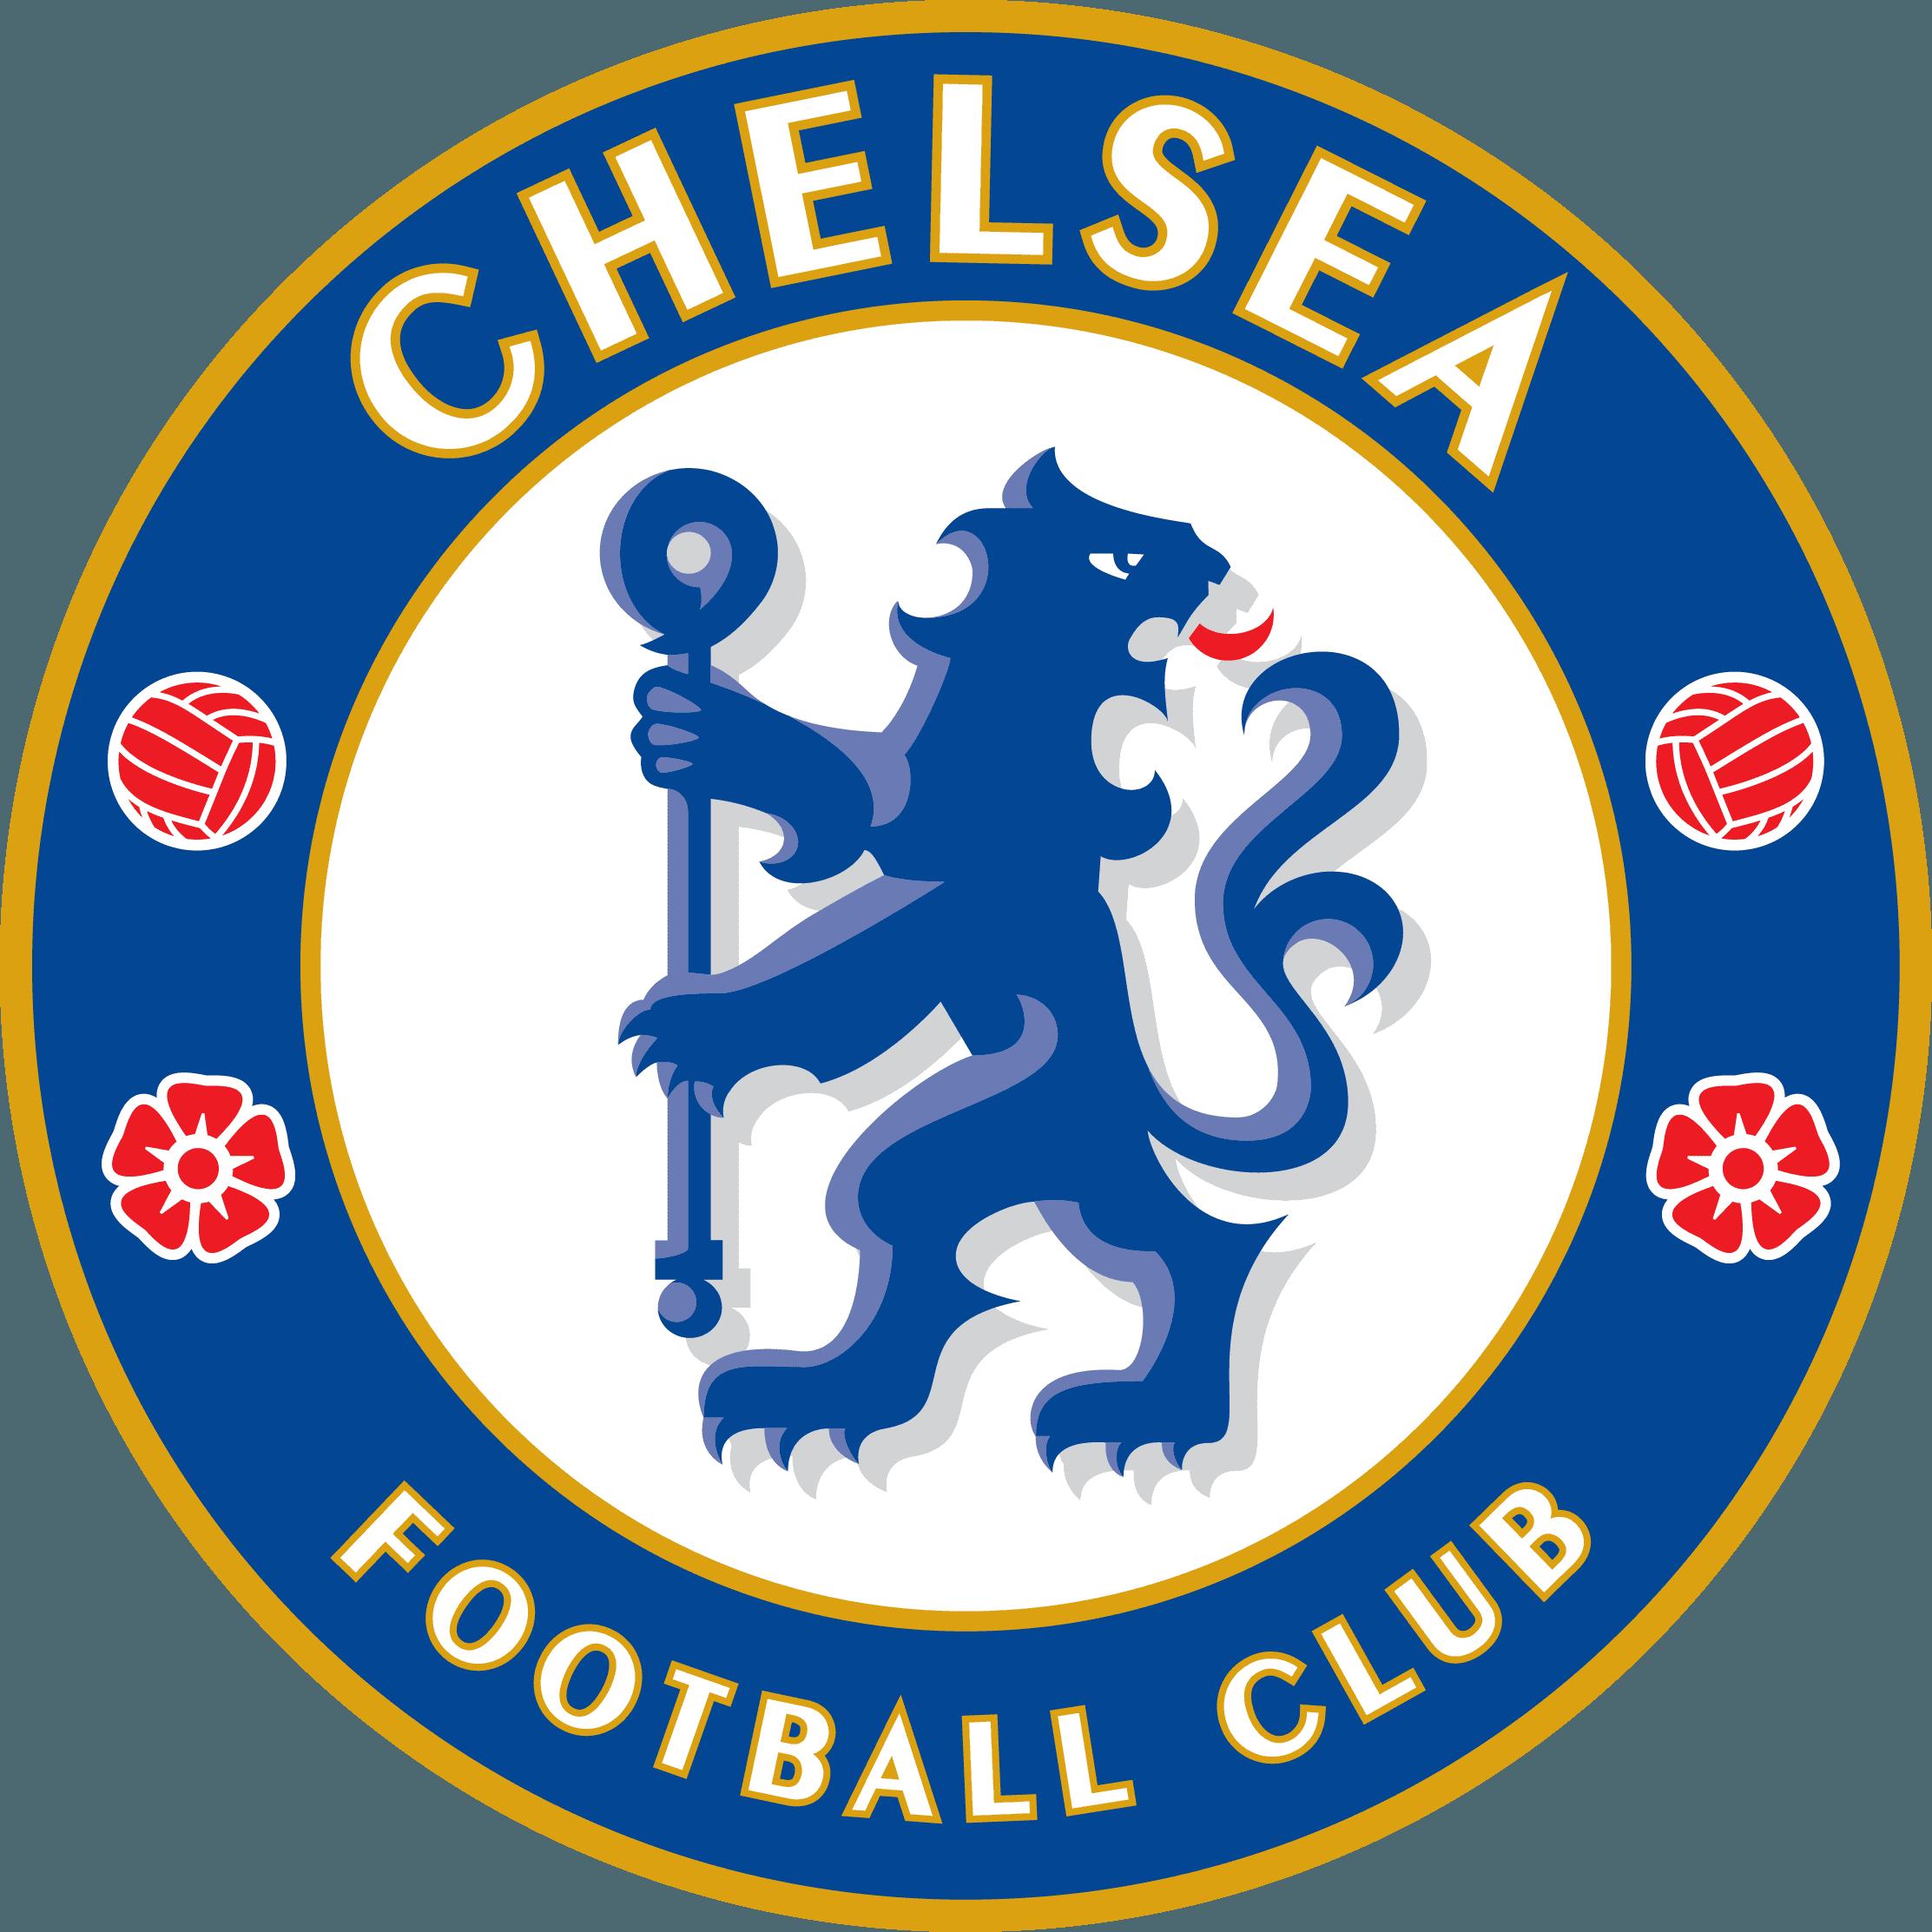 Chelsea Football Club Logo [chelseafc.com] png